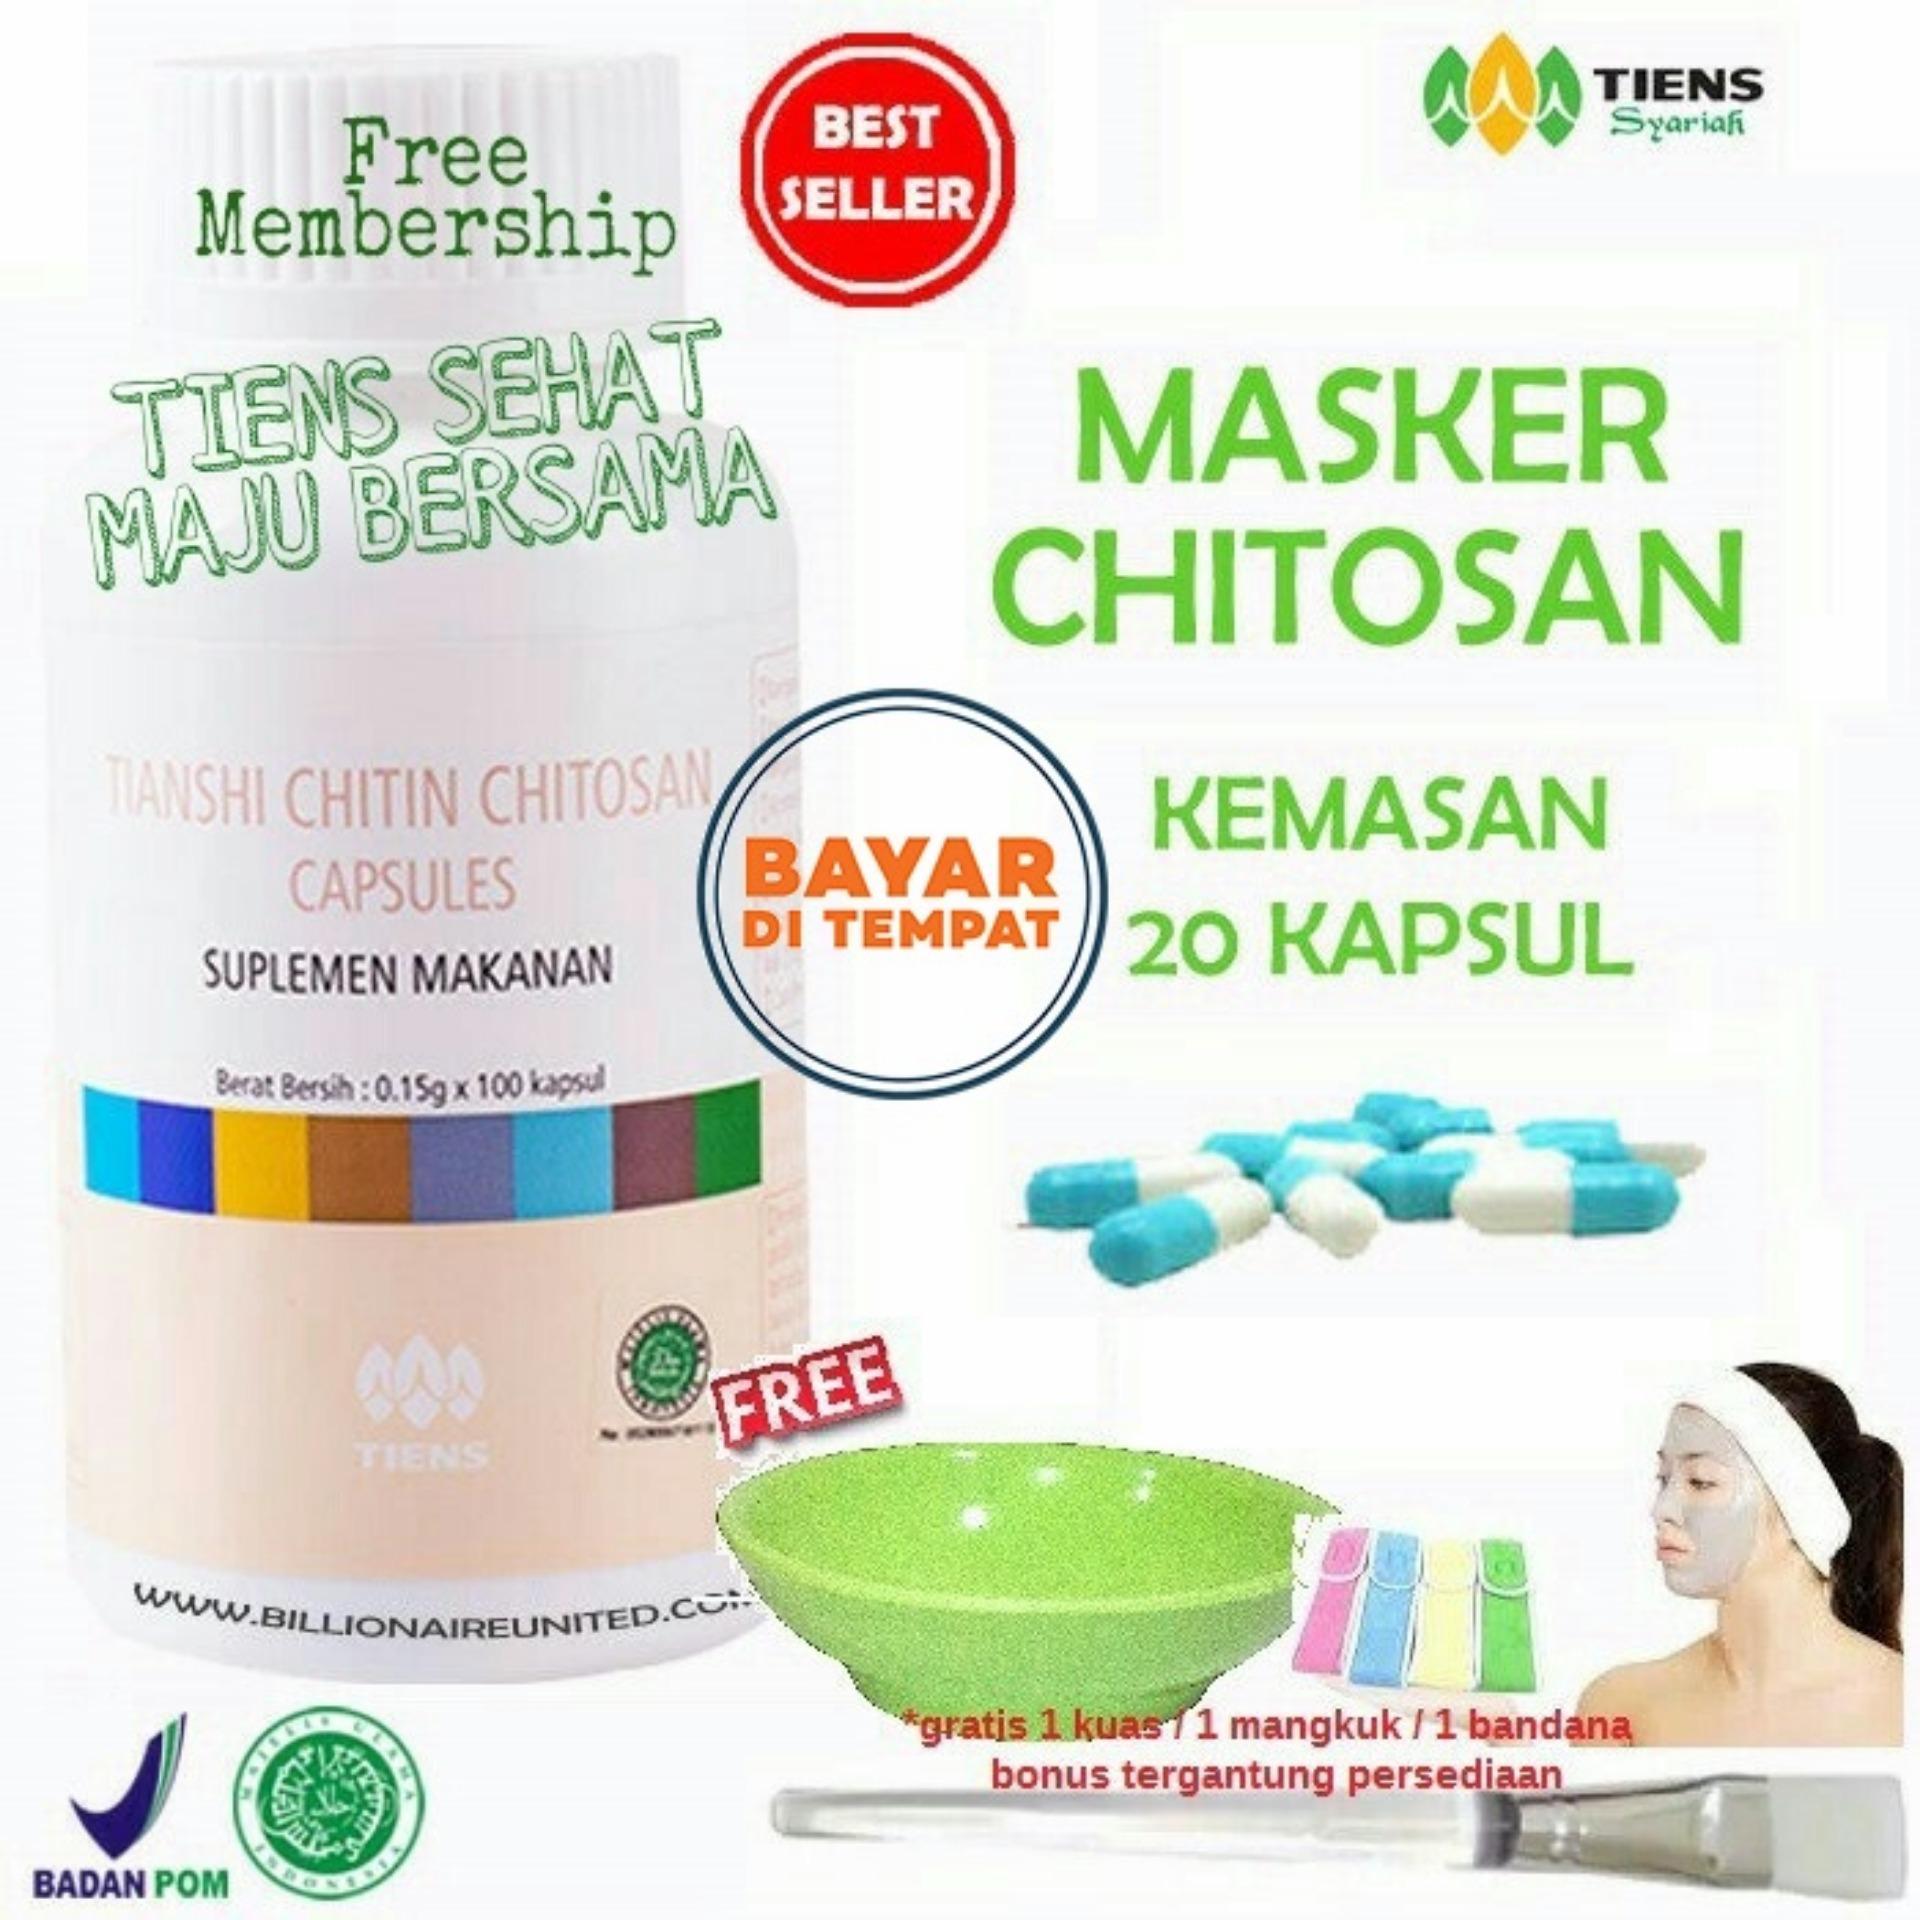 Tiens Masker Chitosan Herbal Anti Jerawat - Masker Kulit Berminyak - Masker Penghilang Jerawat - Masker